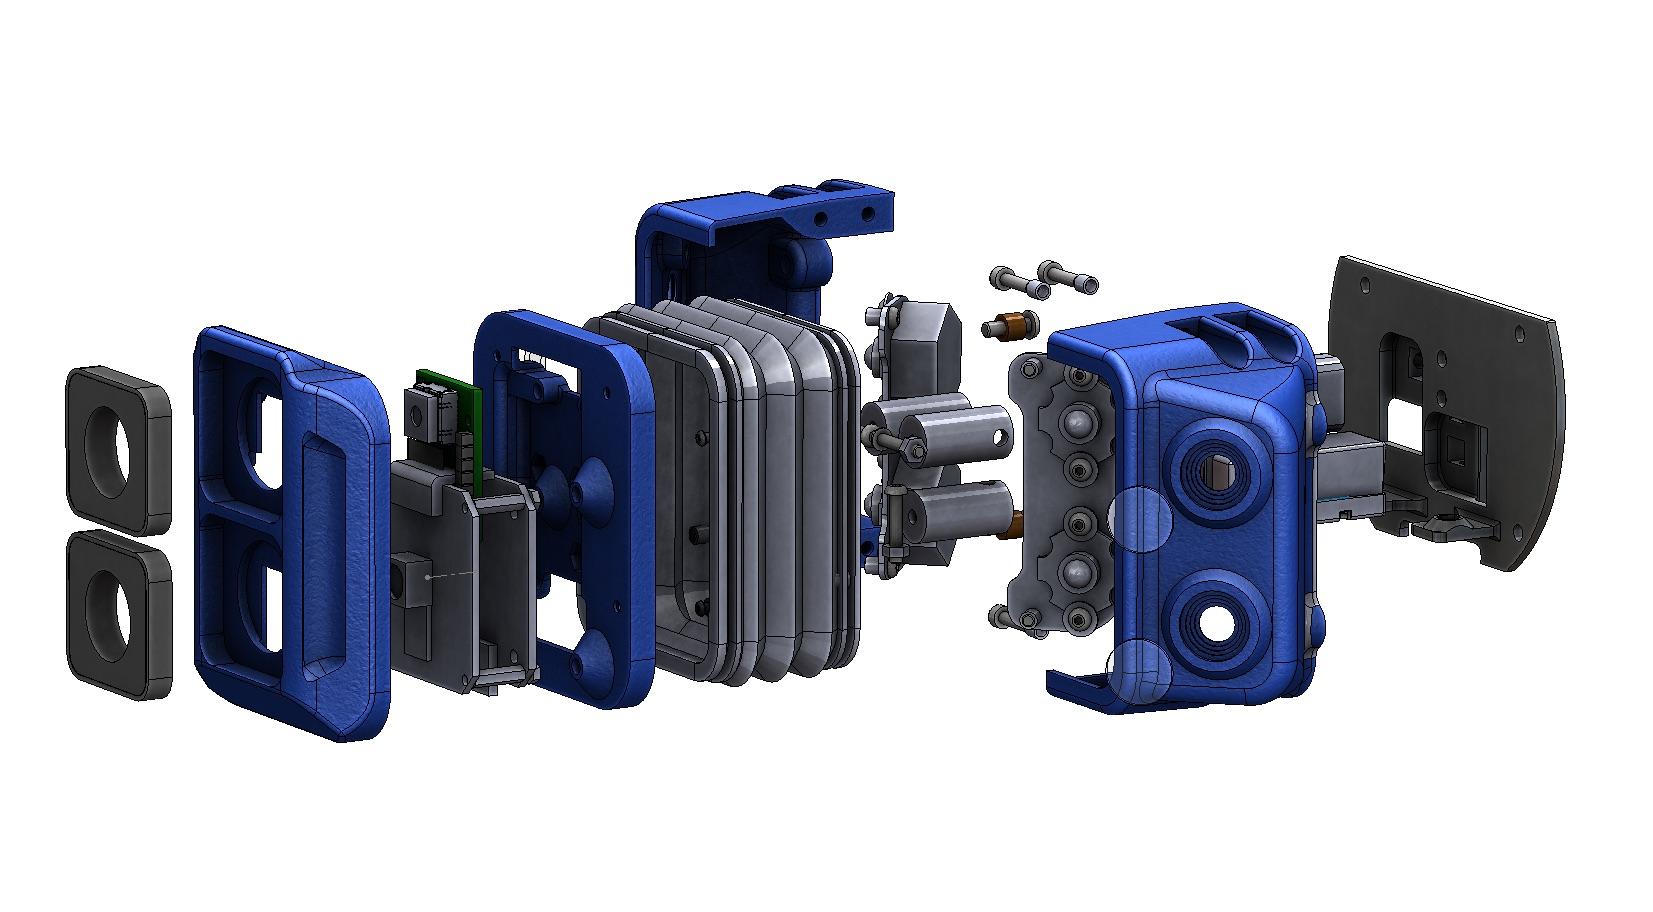 Minigimbal-rover-inspeccion-palas-eolicas